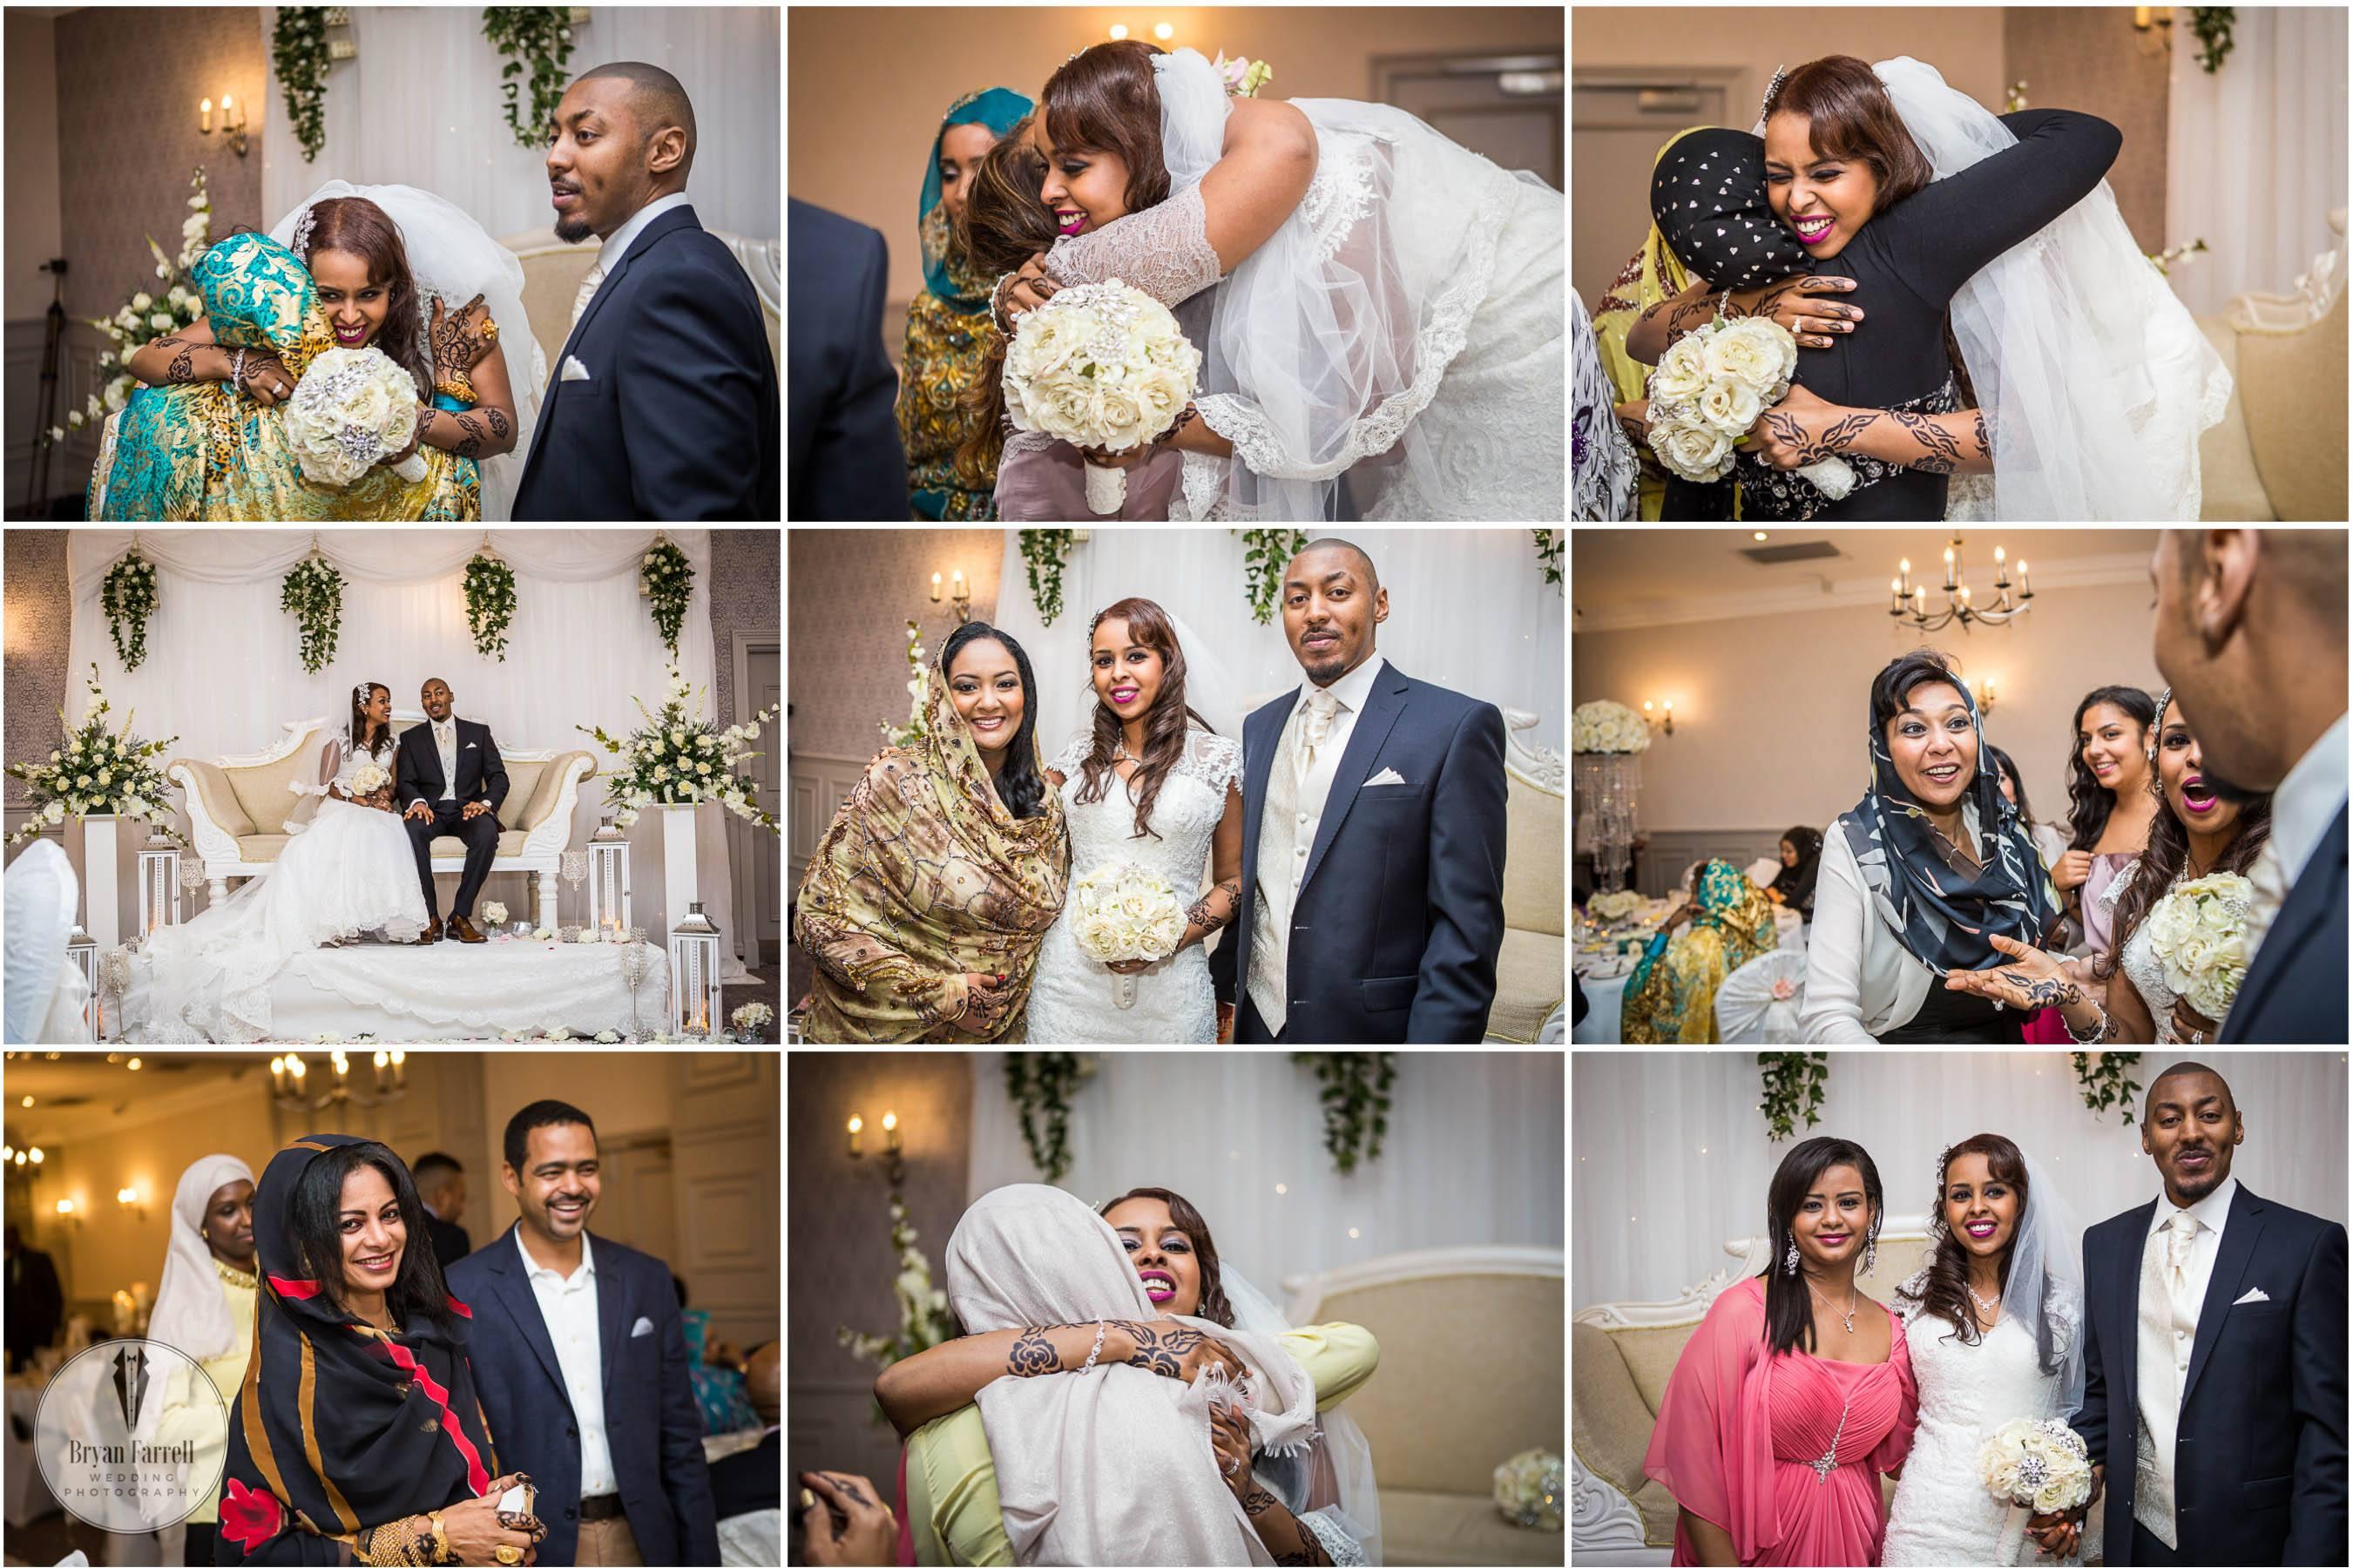 Mottram Hall Wedding 38 1